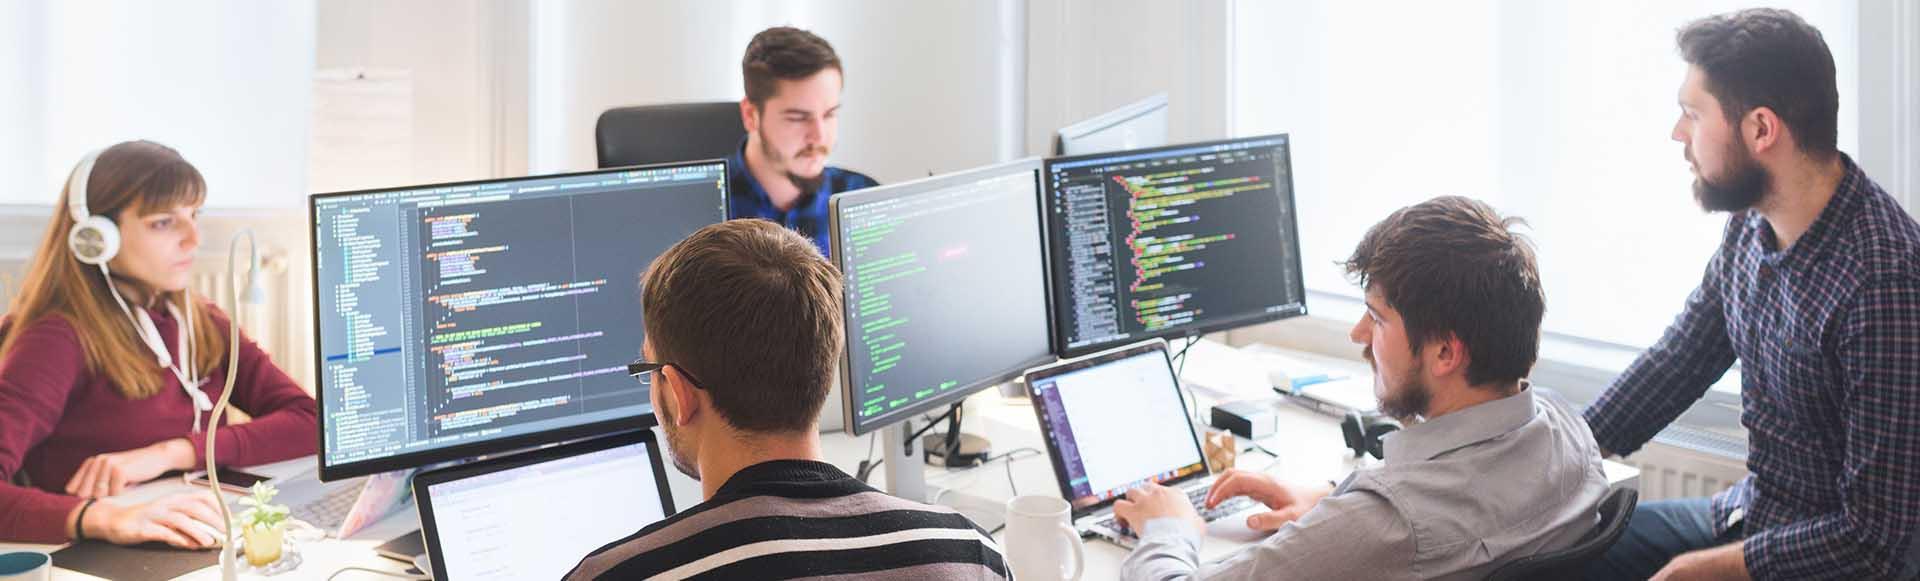 Individuelle Softwareentwicklung